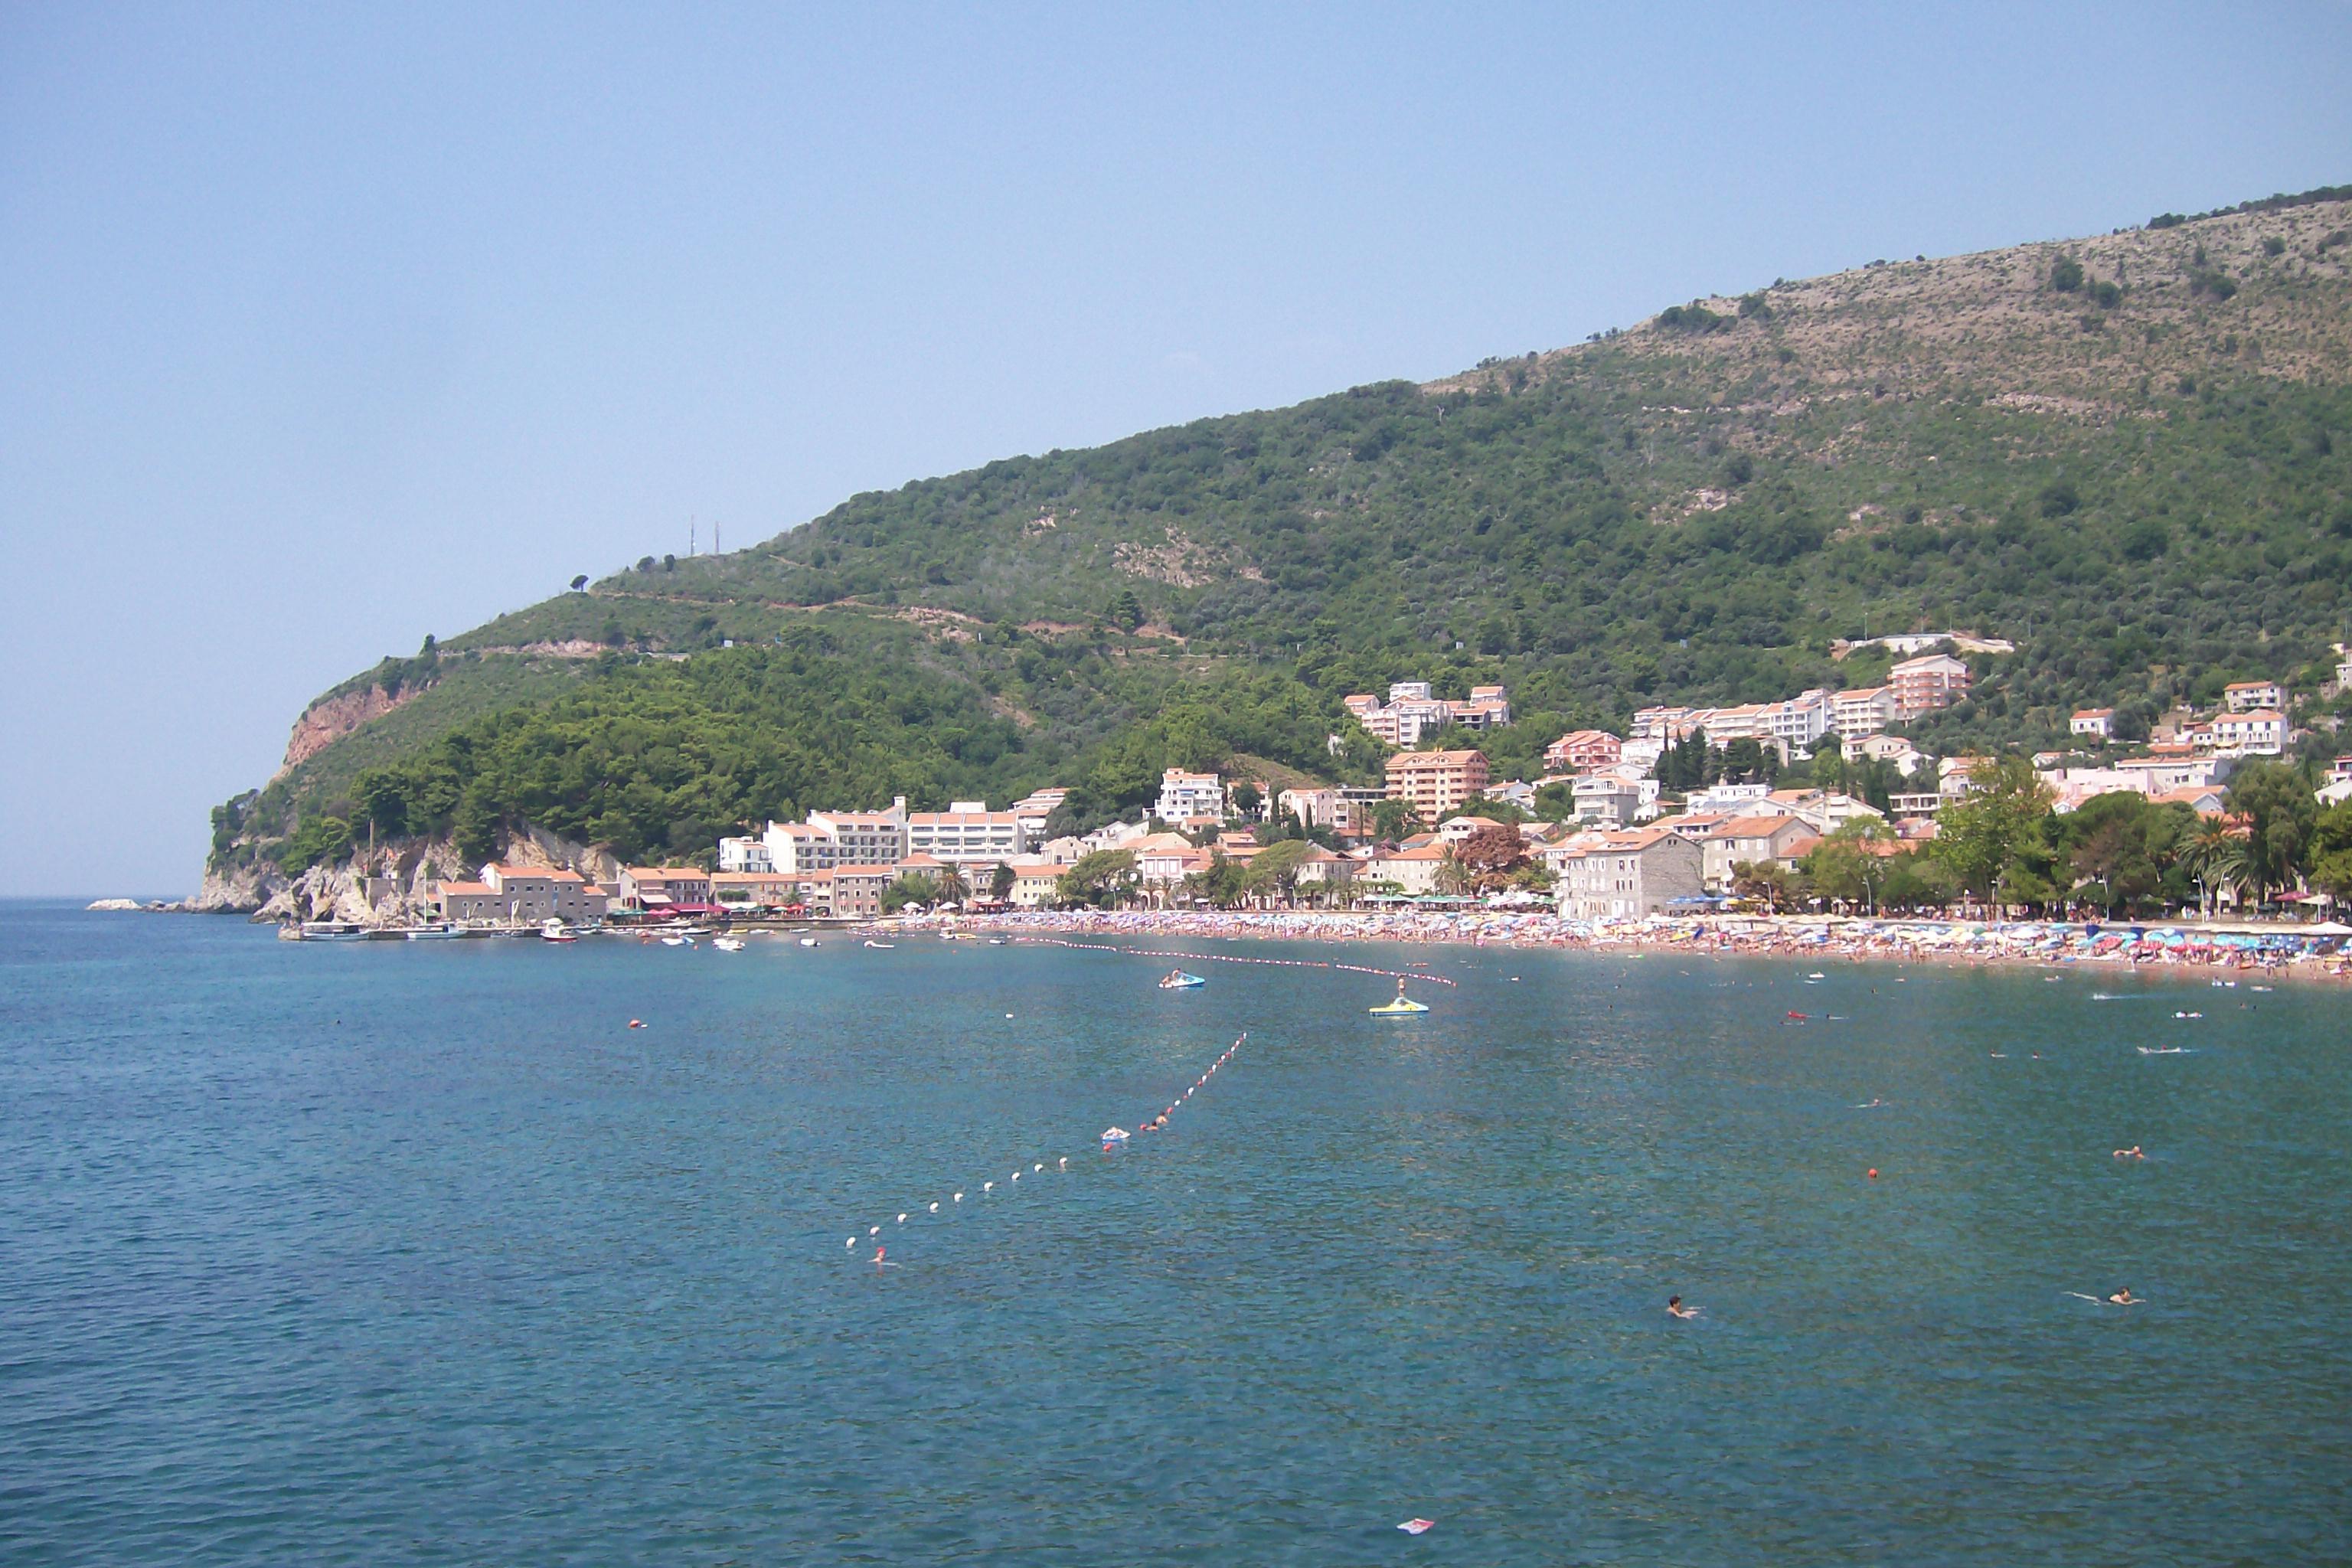 Petrovacas (Juodkalnija)